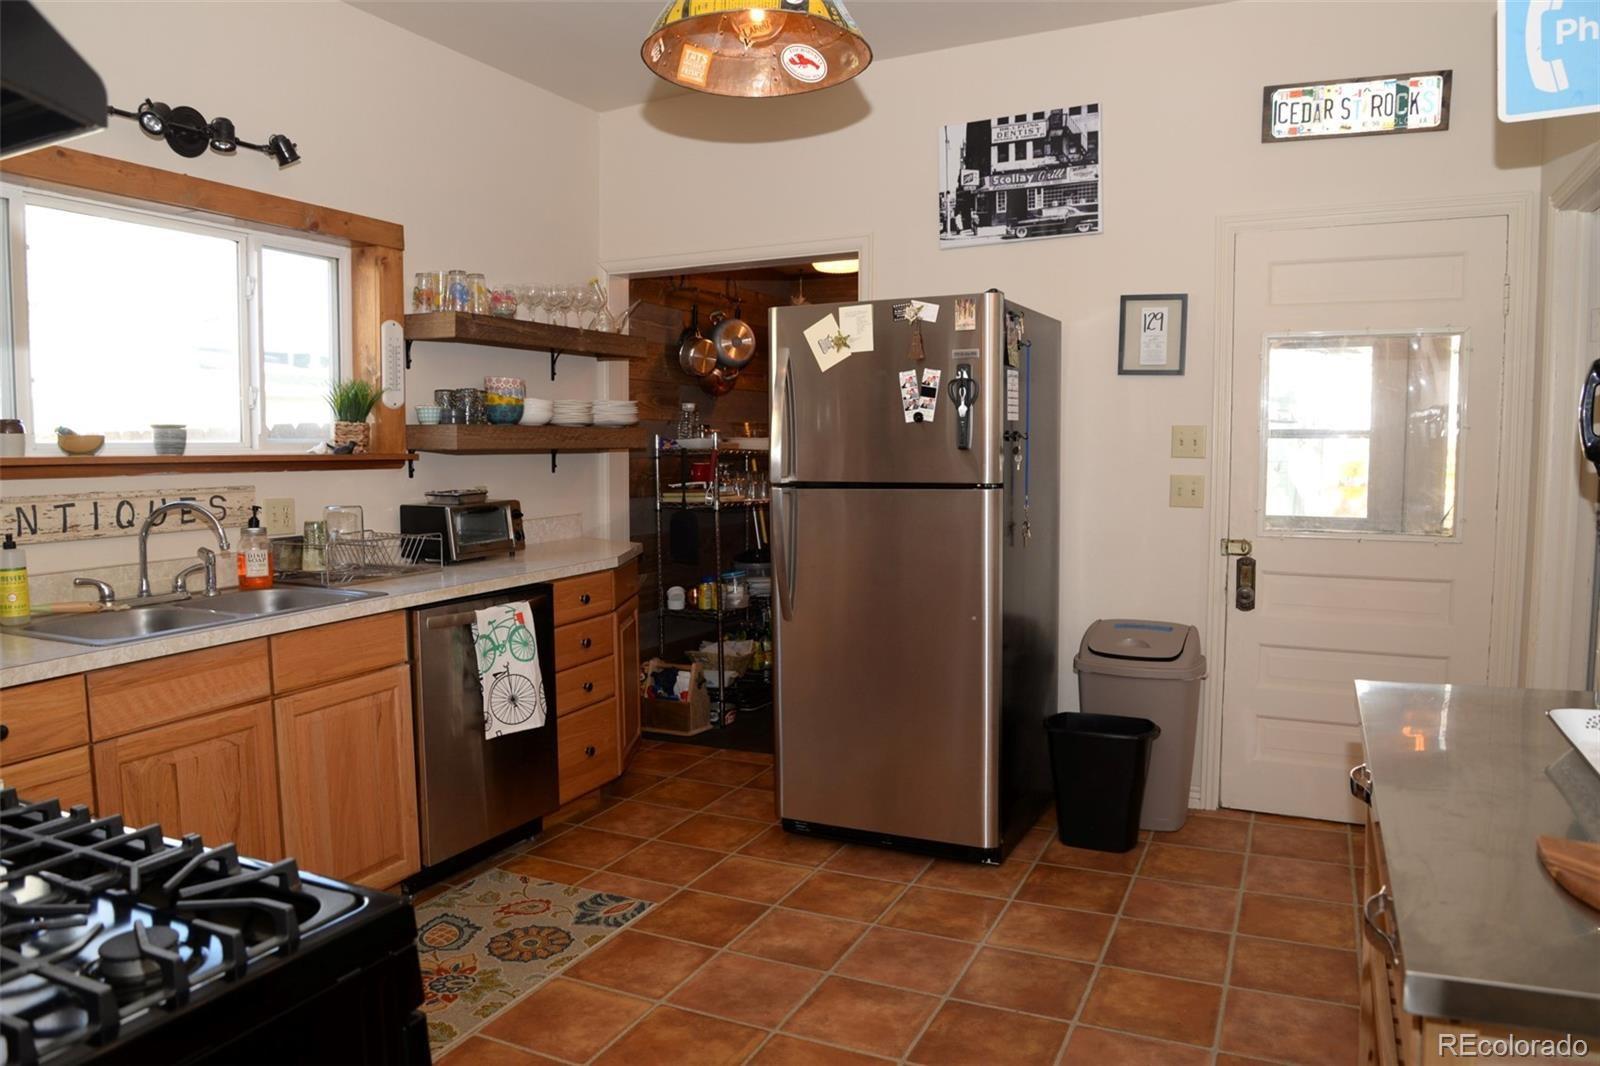 MLS# 4440915 - 22 - 406 Cedar Street, Buena Vista, CO 81211